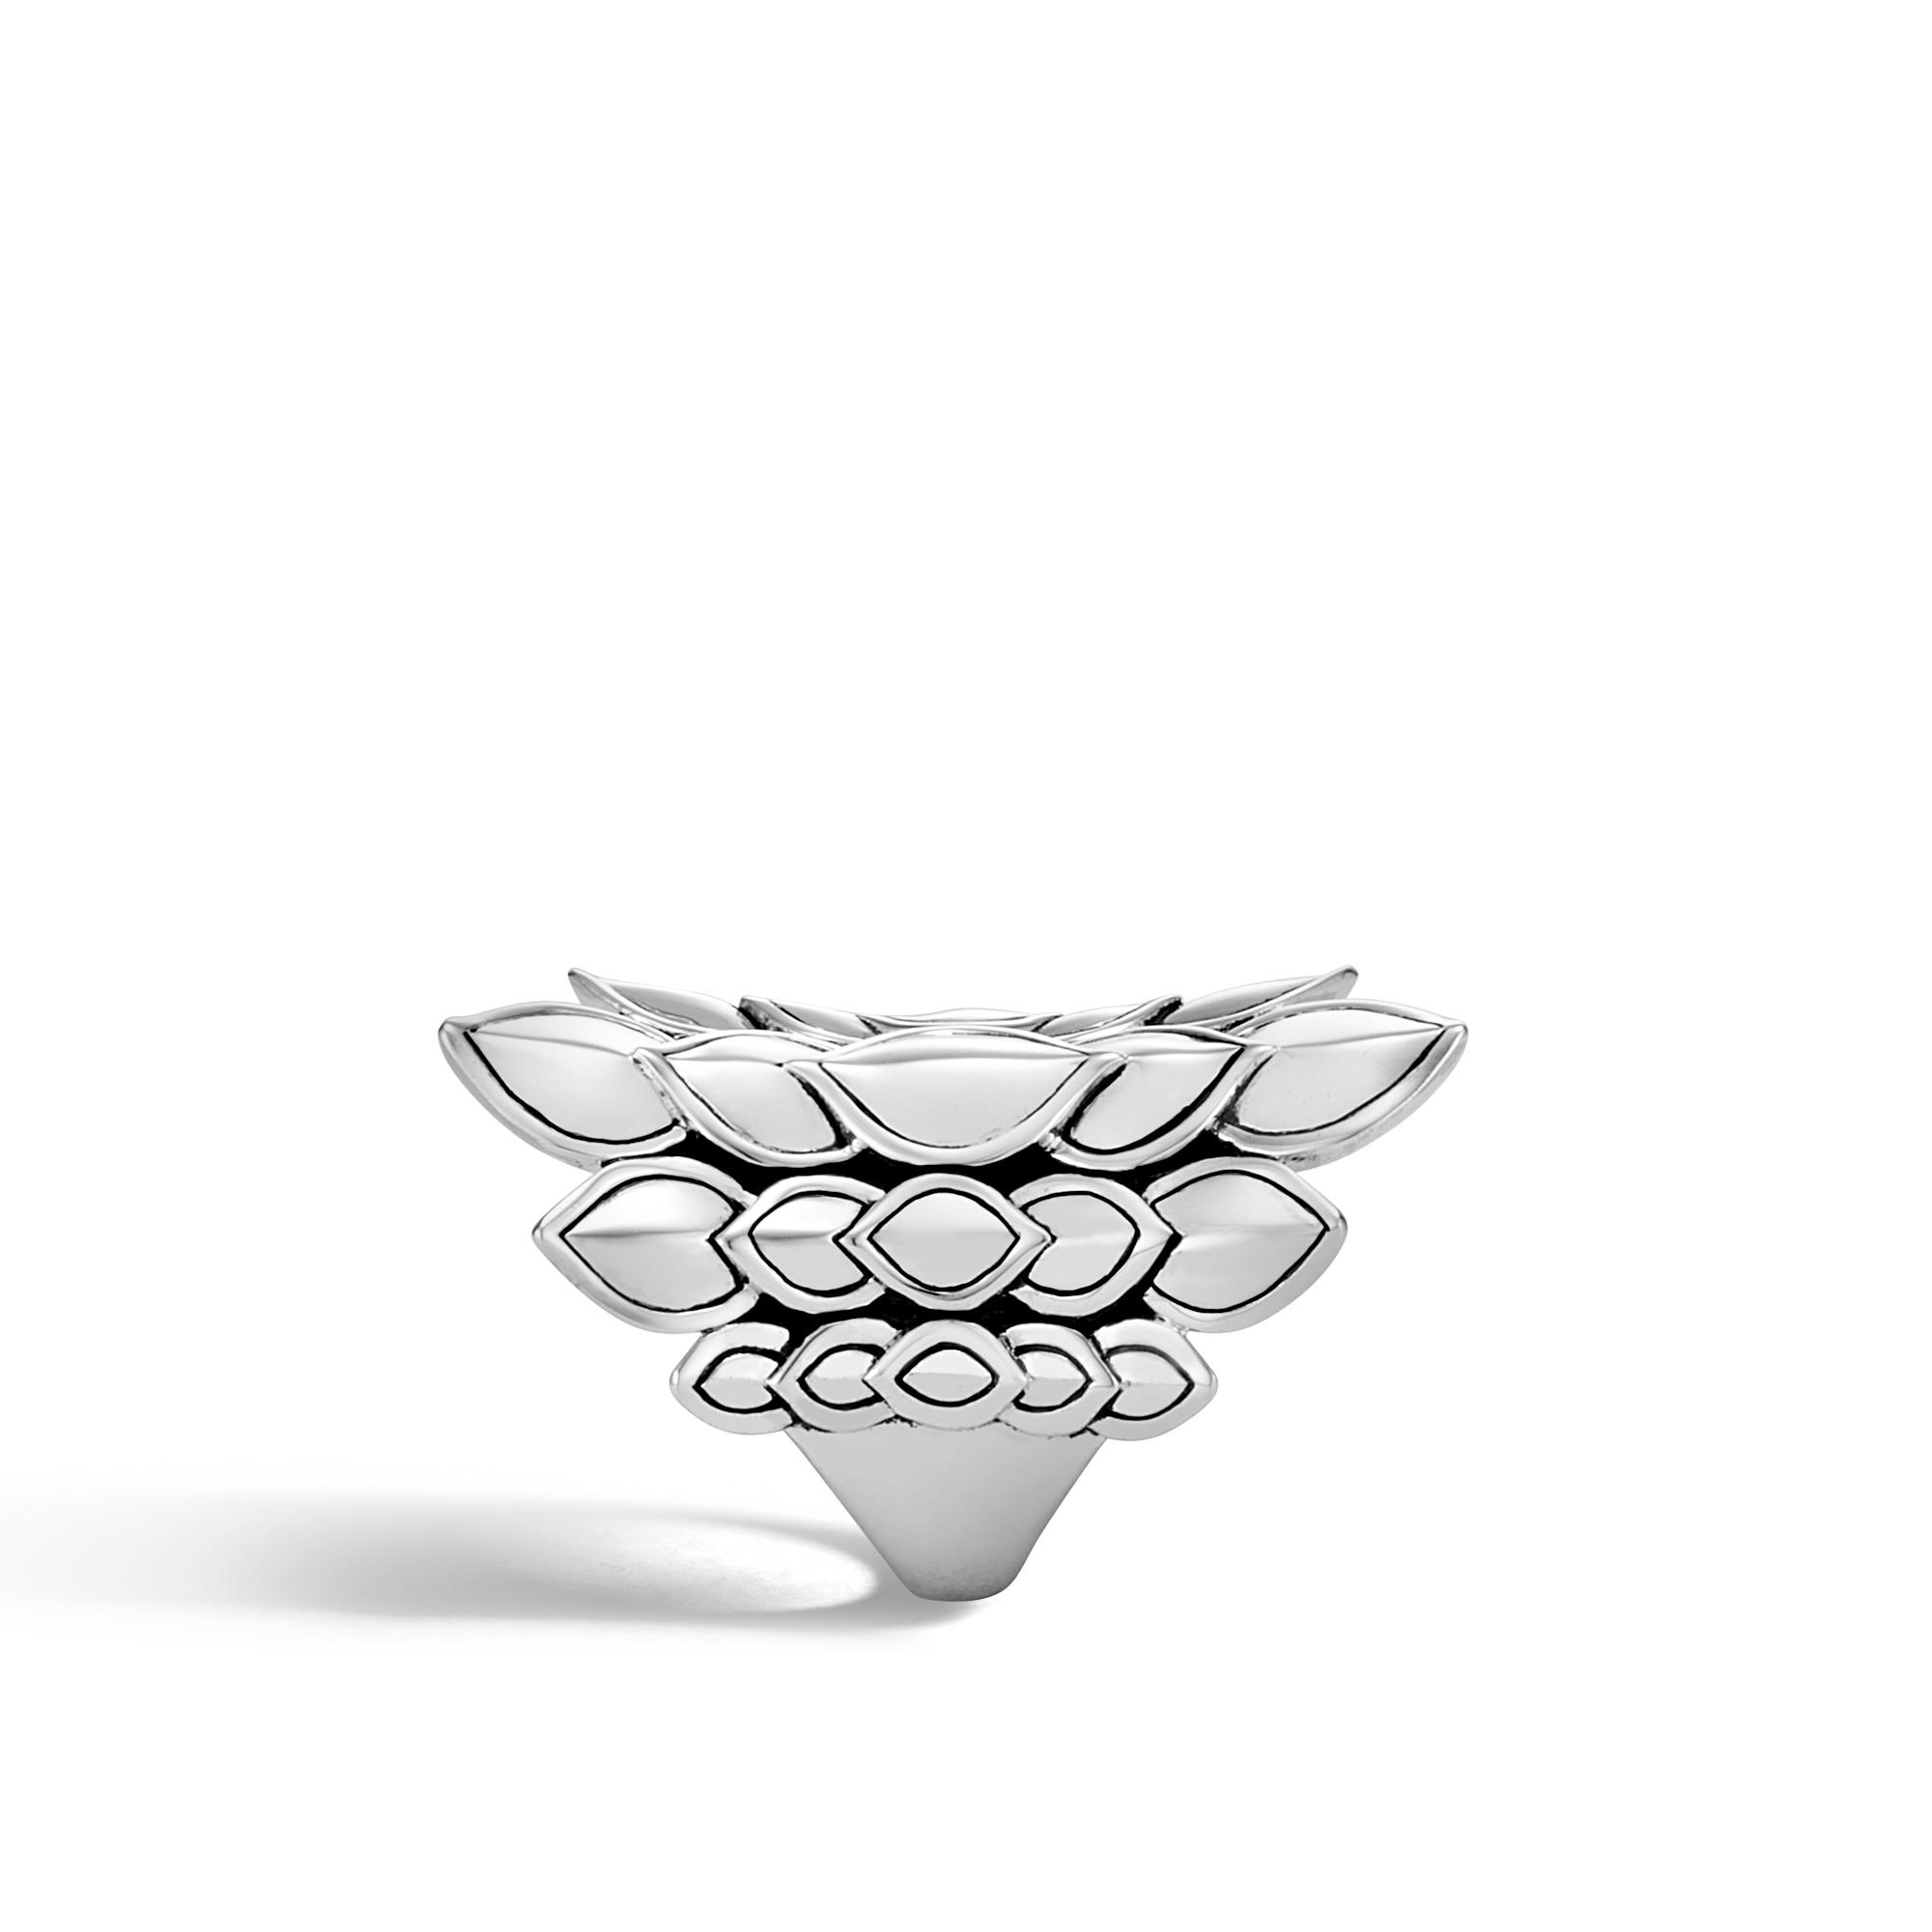 Legends Naga Saddle Ring in Silver, , large